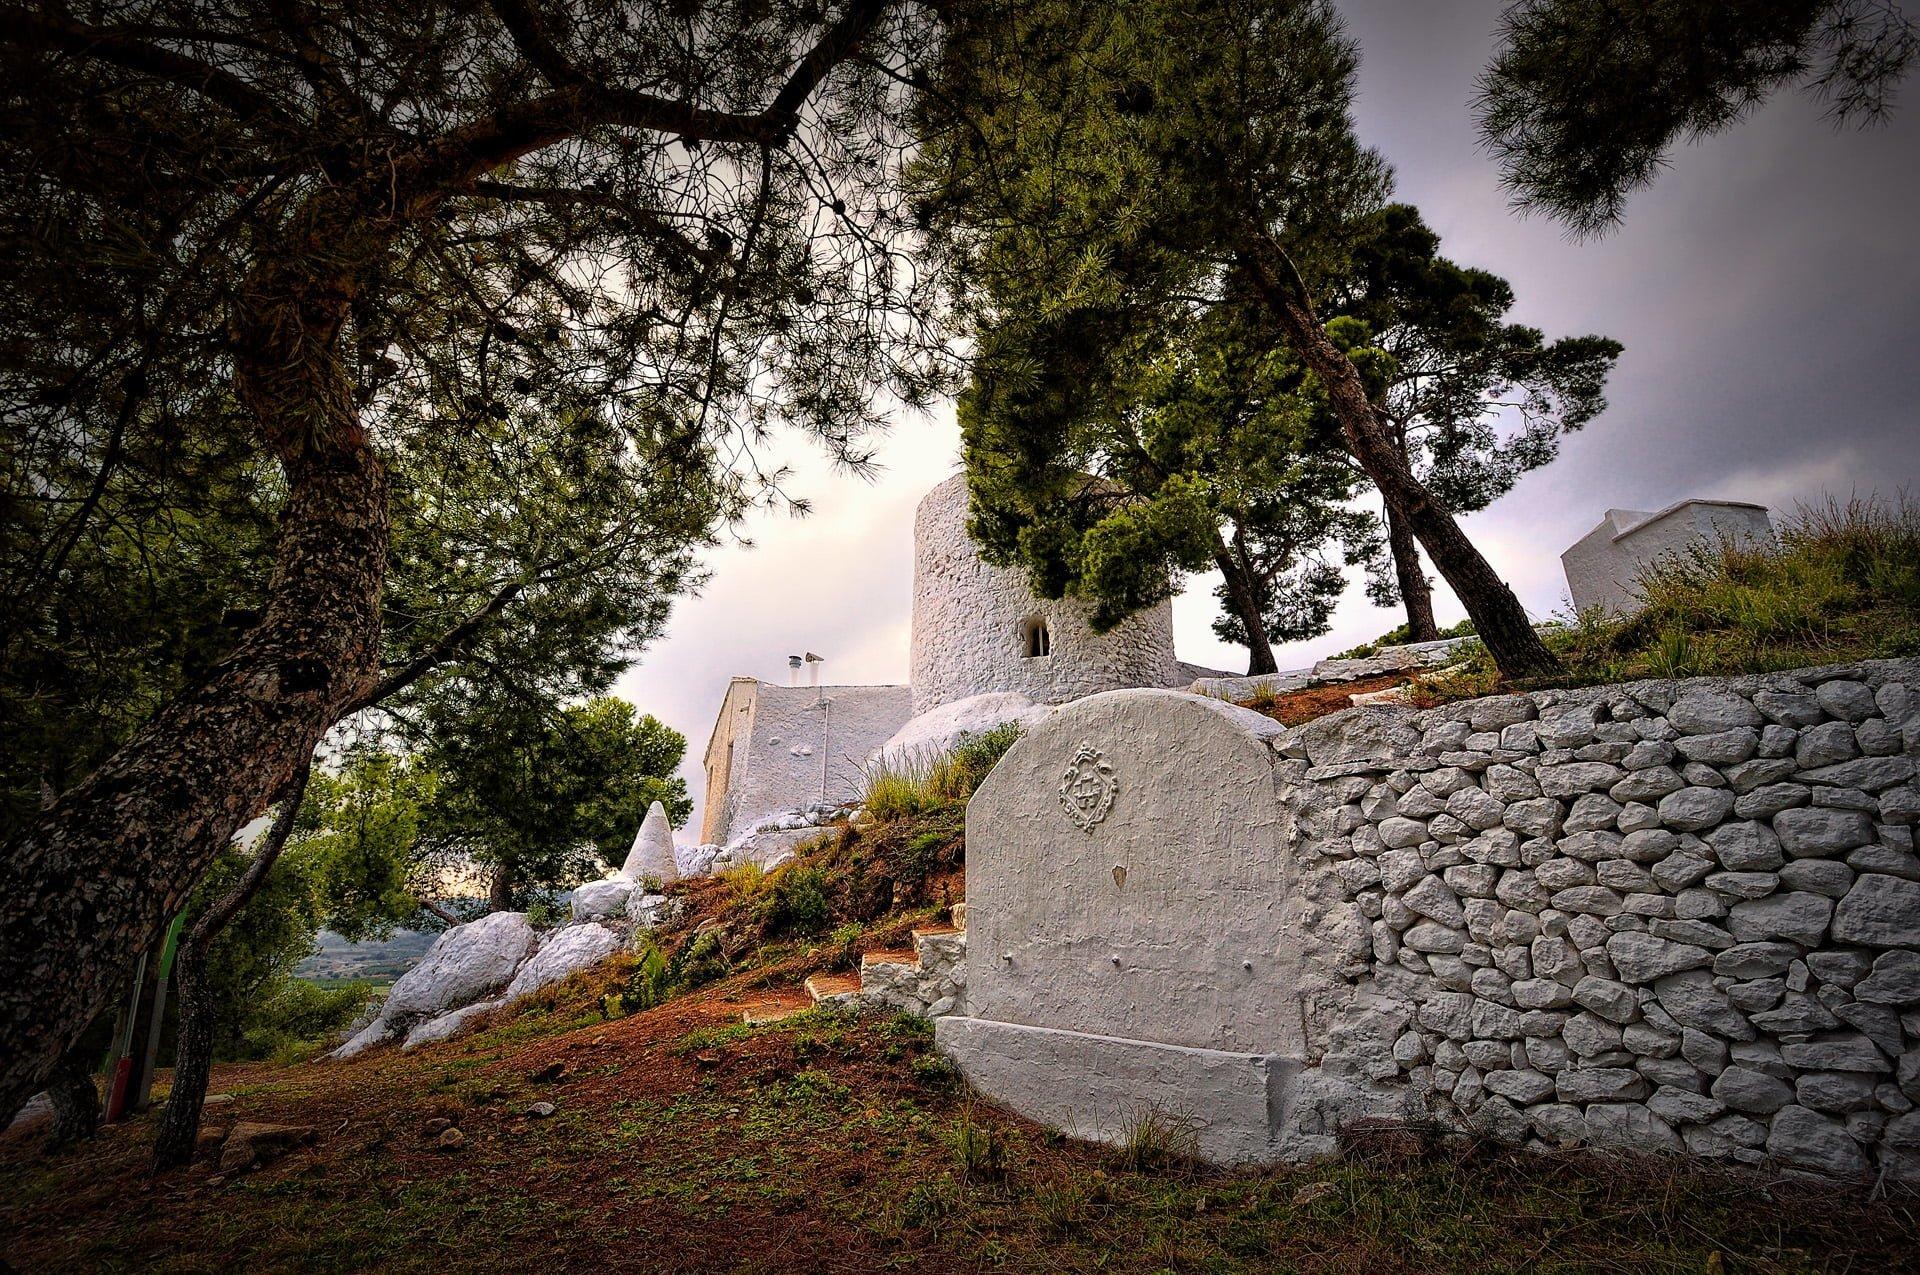 magdalena tarihi yapı